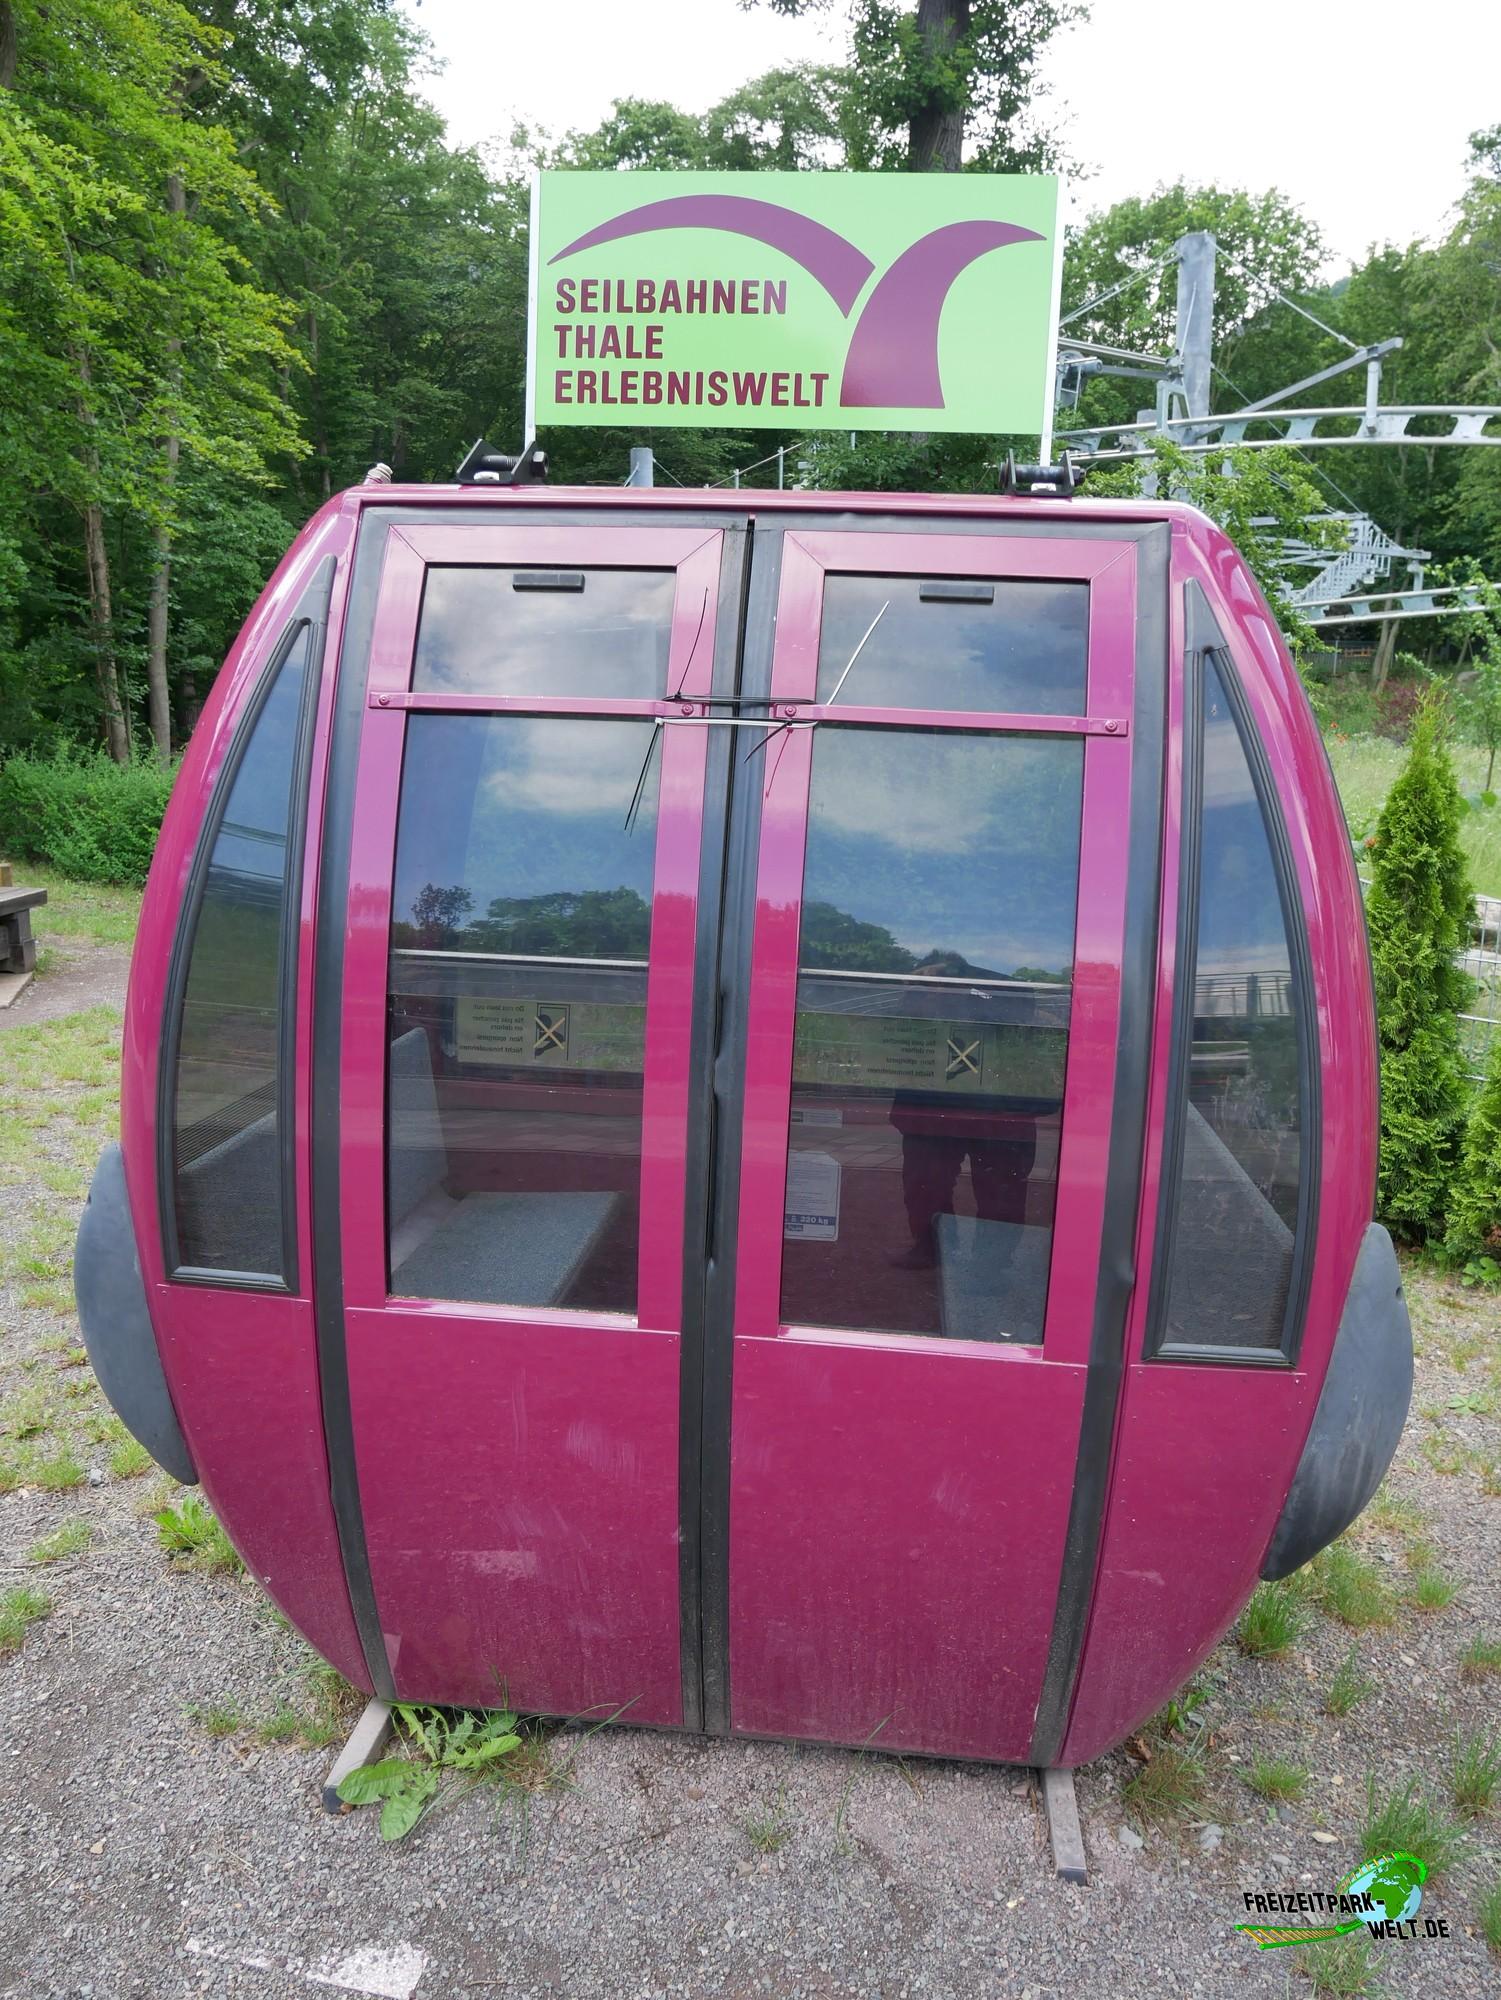 Kabinenbahn Hexentanzplatz   Erlebniswelt Thale   Freizeitpark Welt.de